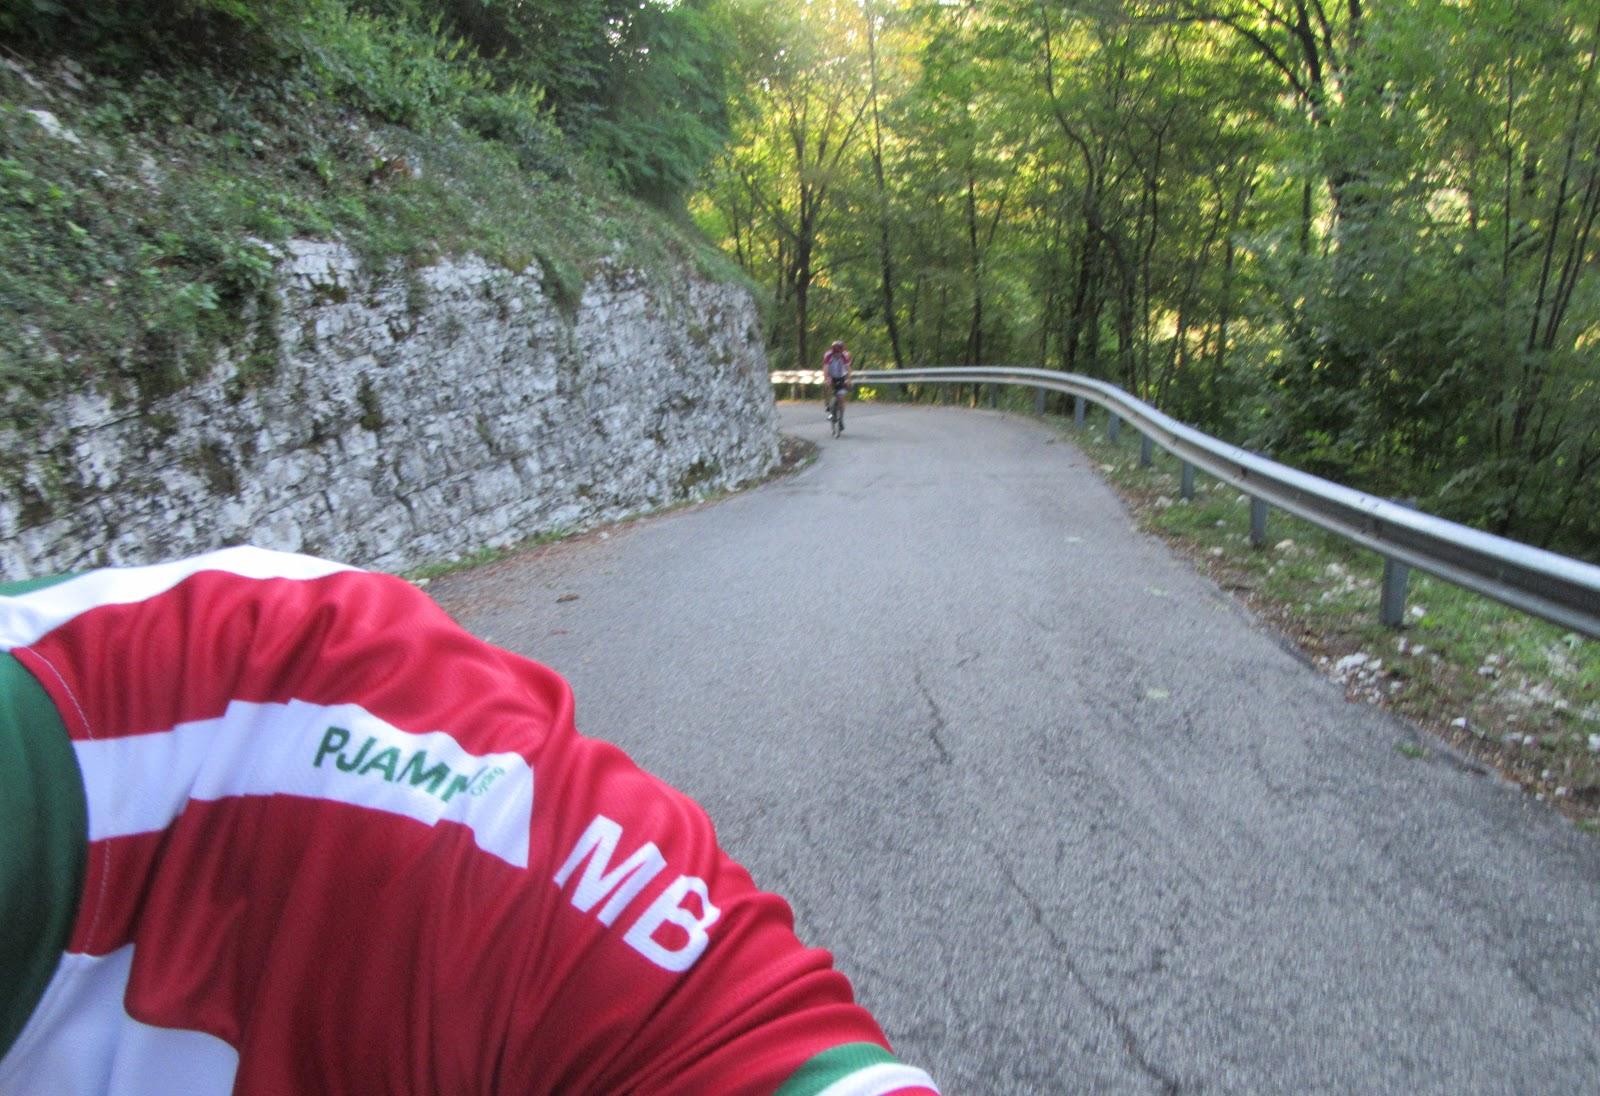 Cycling Monte Grappa - Cavaso del Tomba - roadway and cyclist